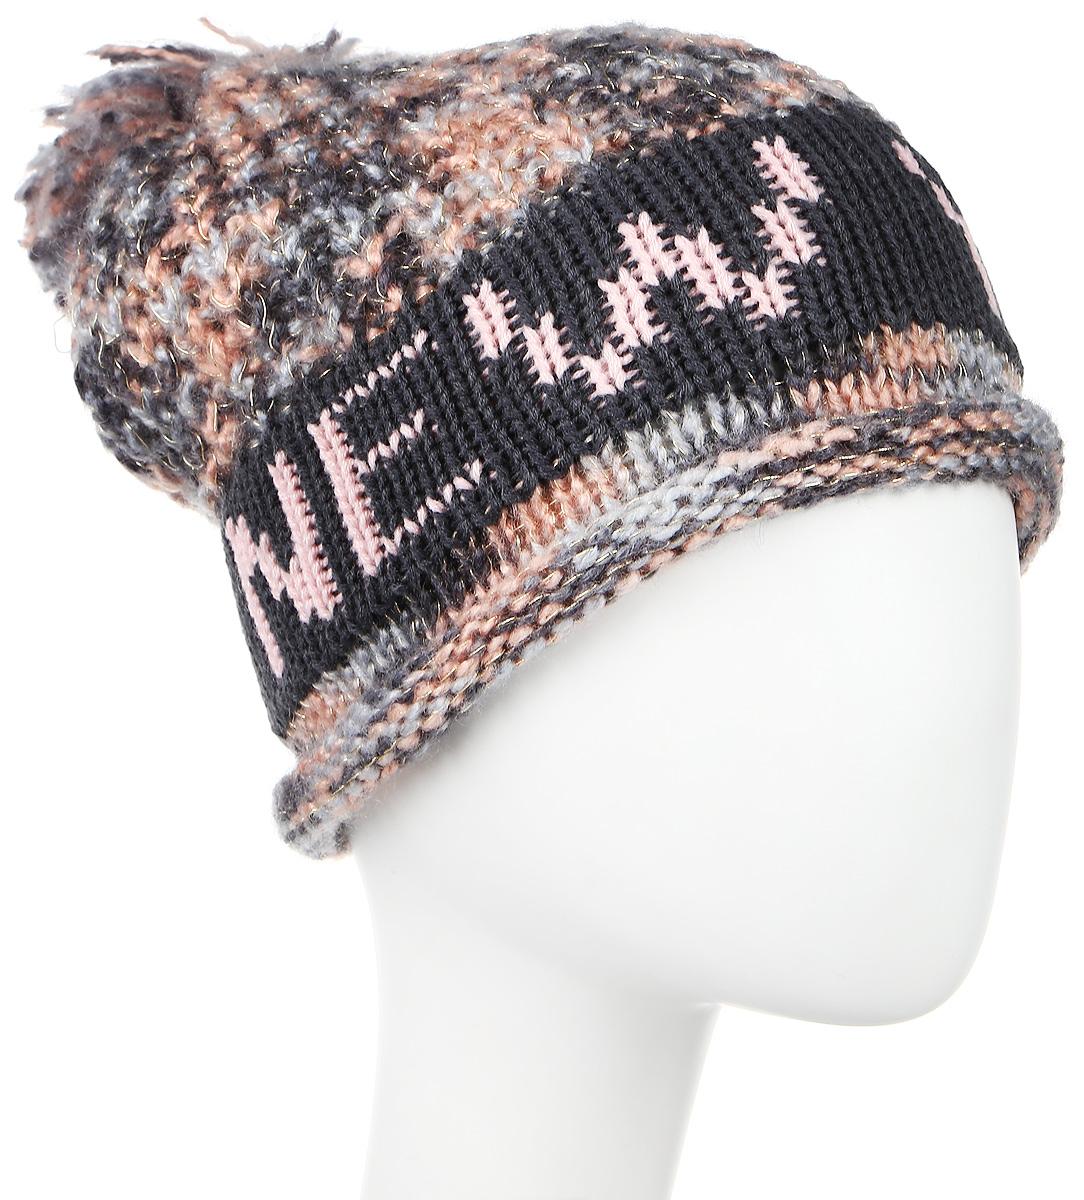 цена Шапка Robin Ruth New York, цвет: серый, розовый. HNY156-E. Размер универсальный онлайн в 2017 году